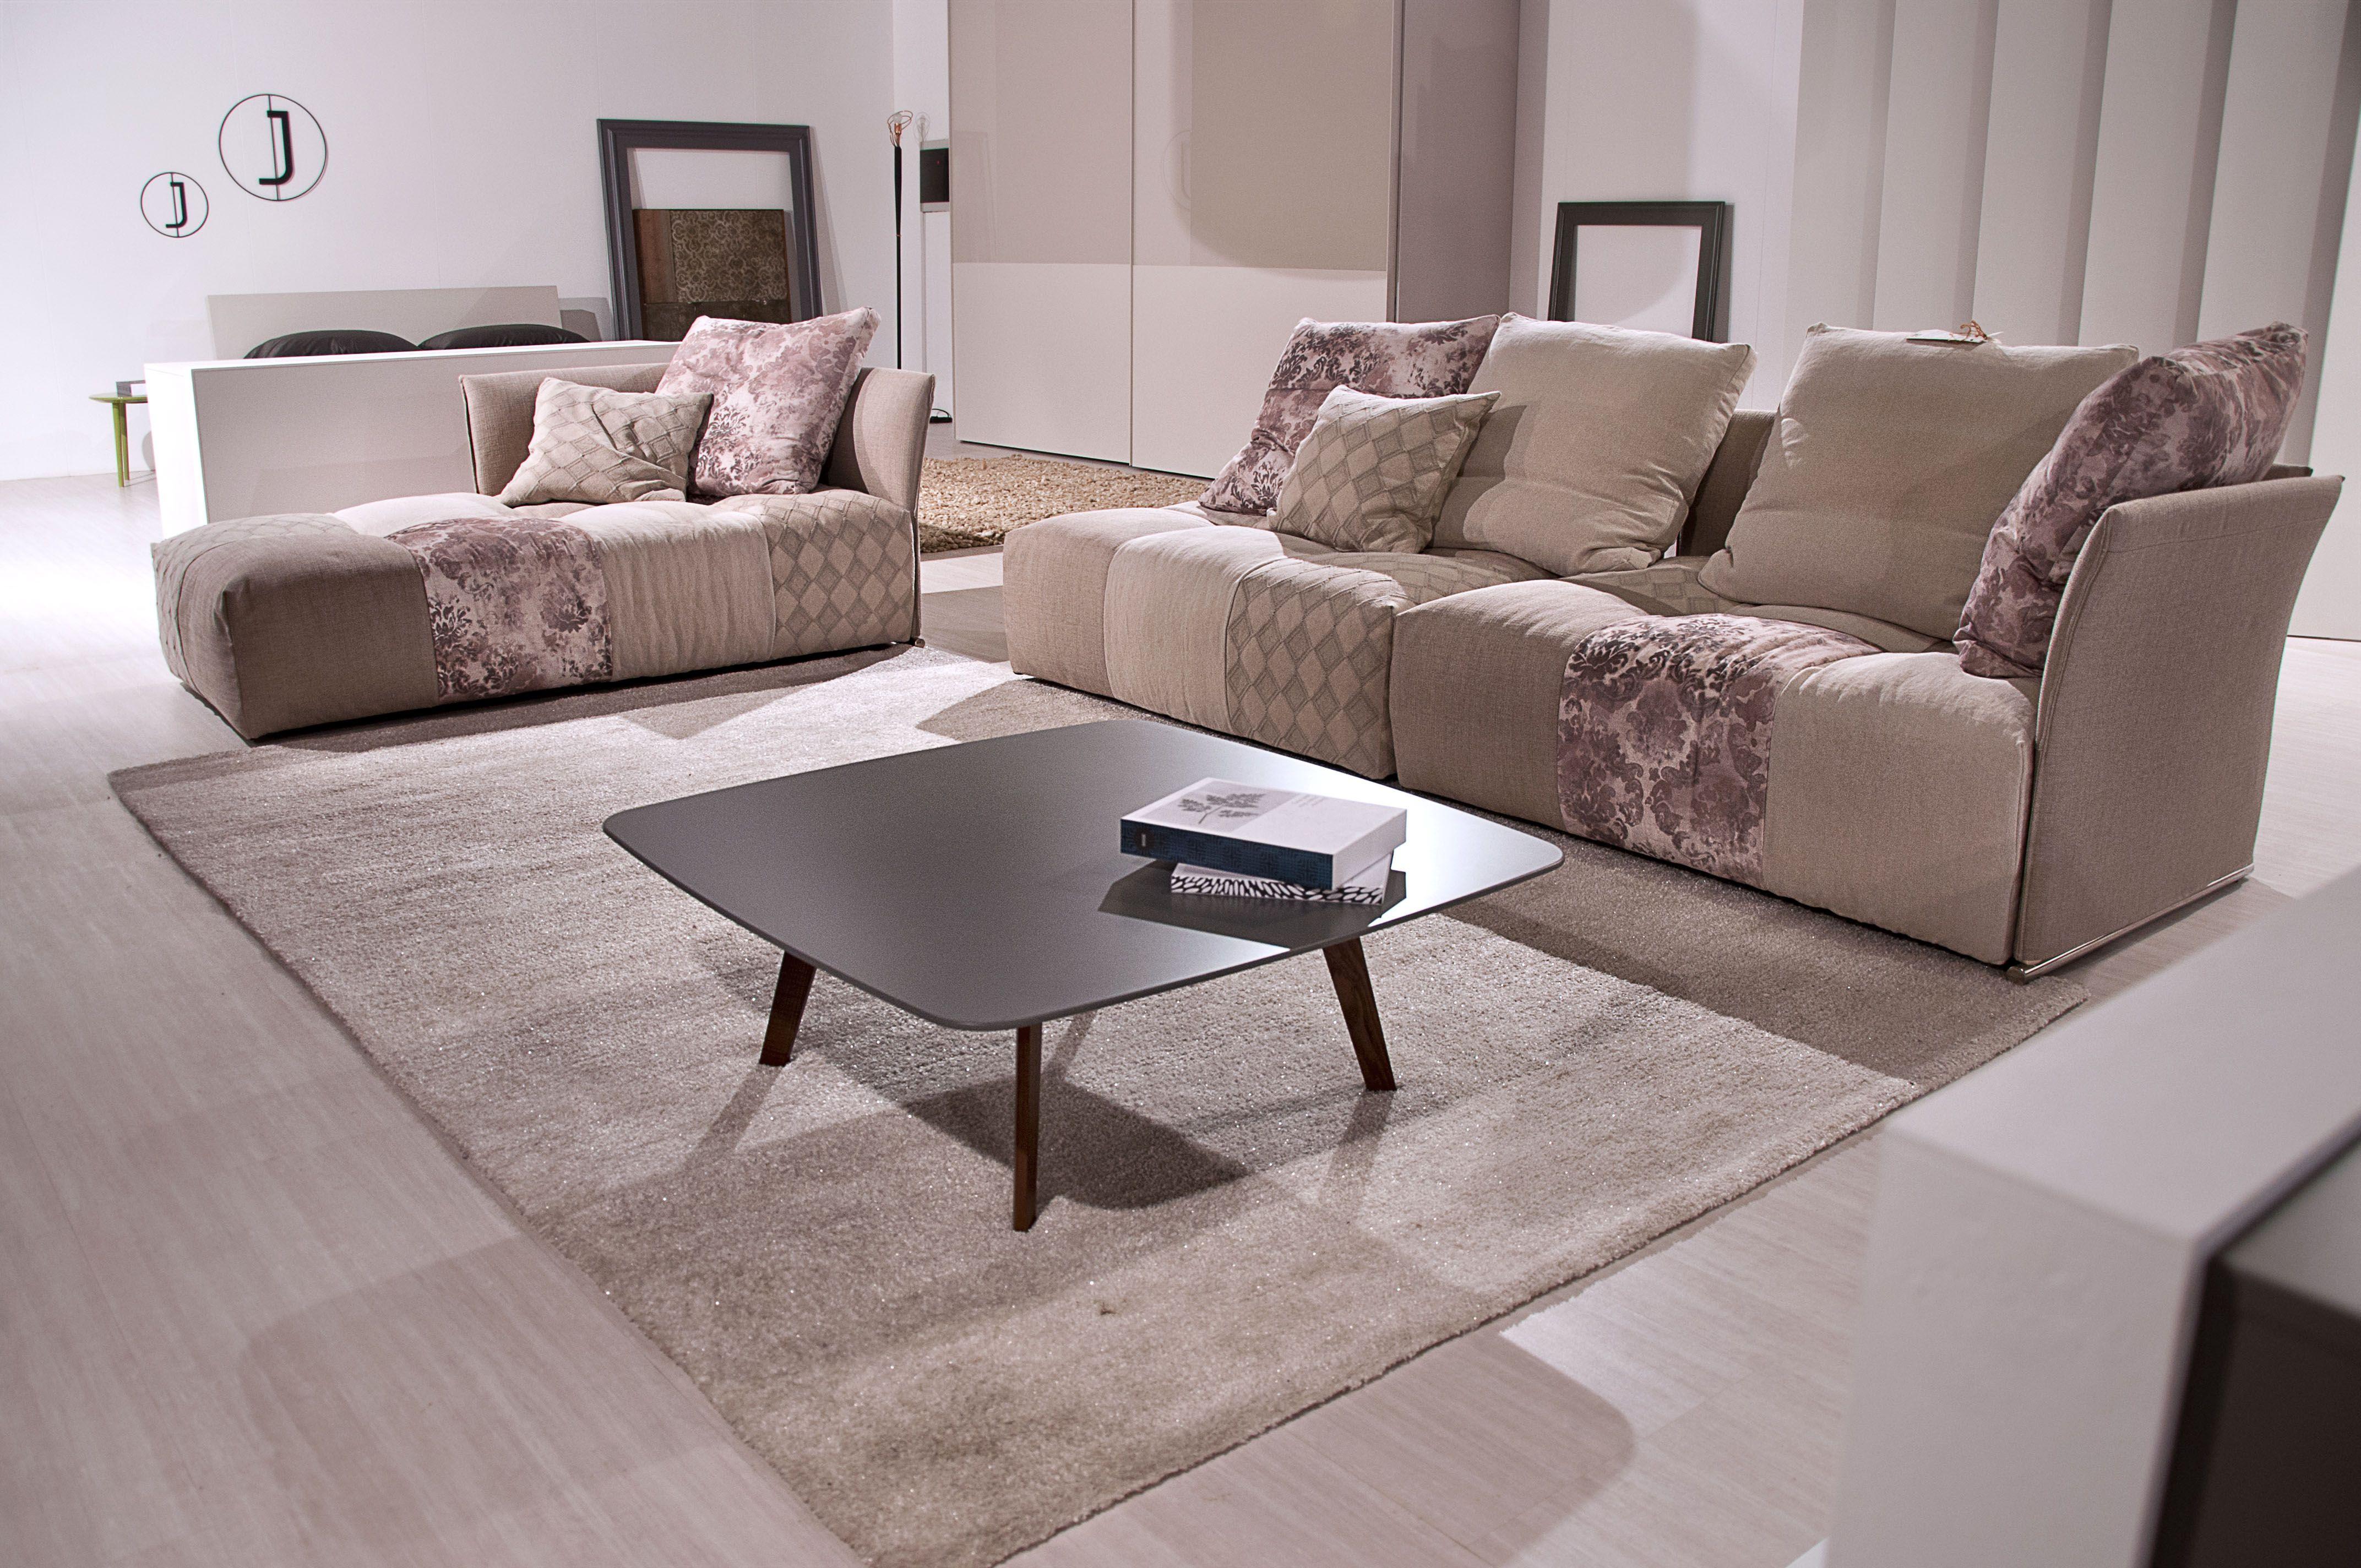 Divano pixel di saba divani pinterest punti vendita for Turco arredamenti offerte